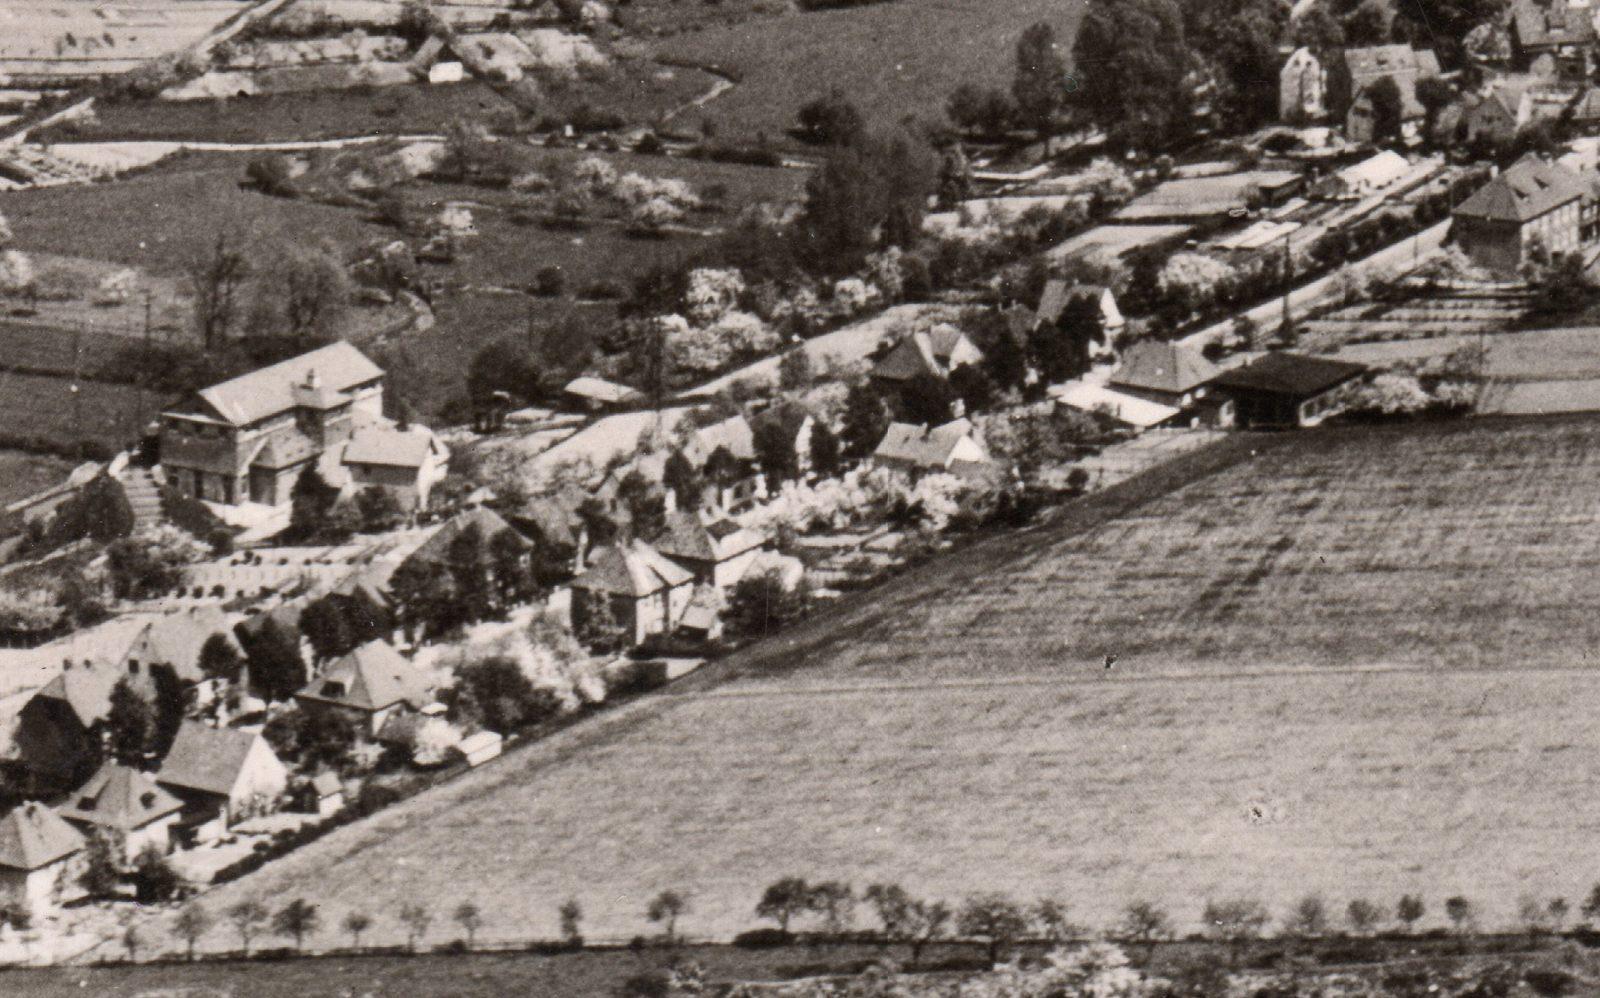 BS 1960 Straßenzug zoom groß1600